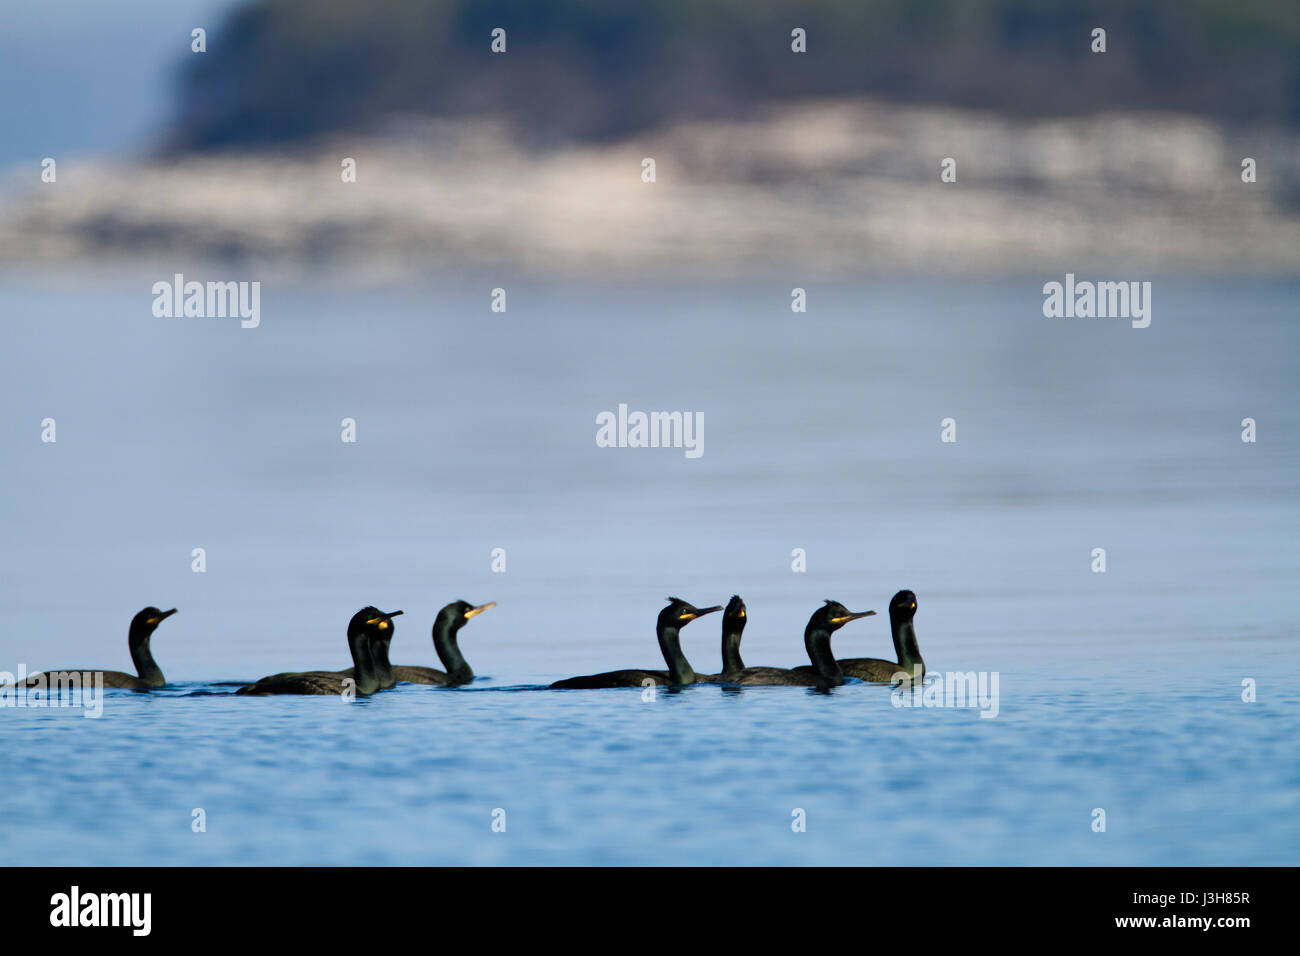 Shag from Brijuni National Park - Stock Image